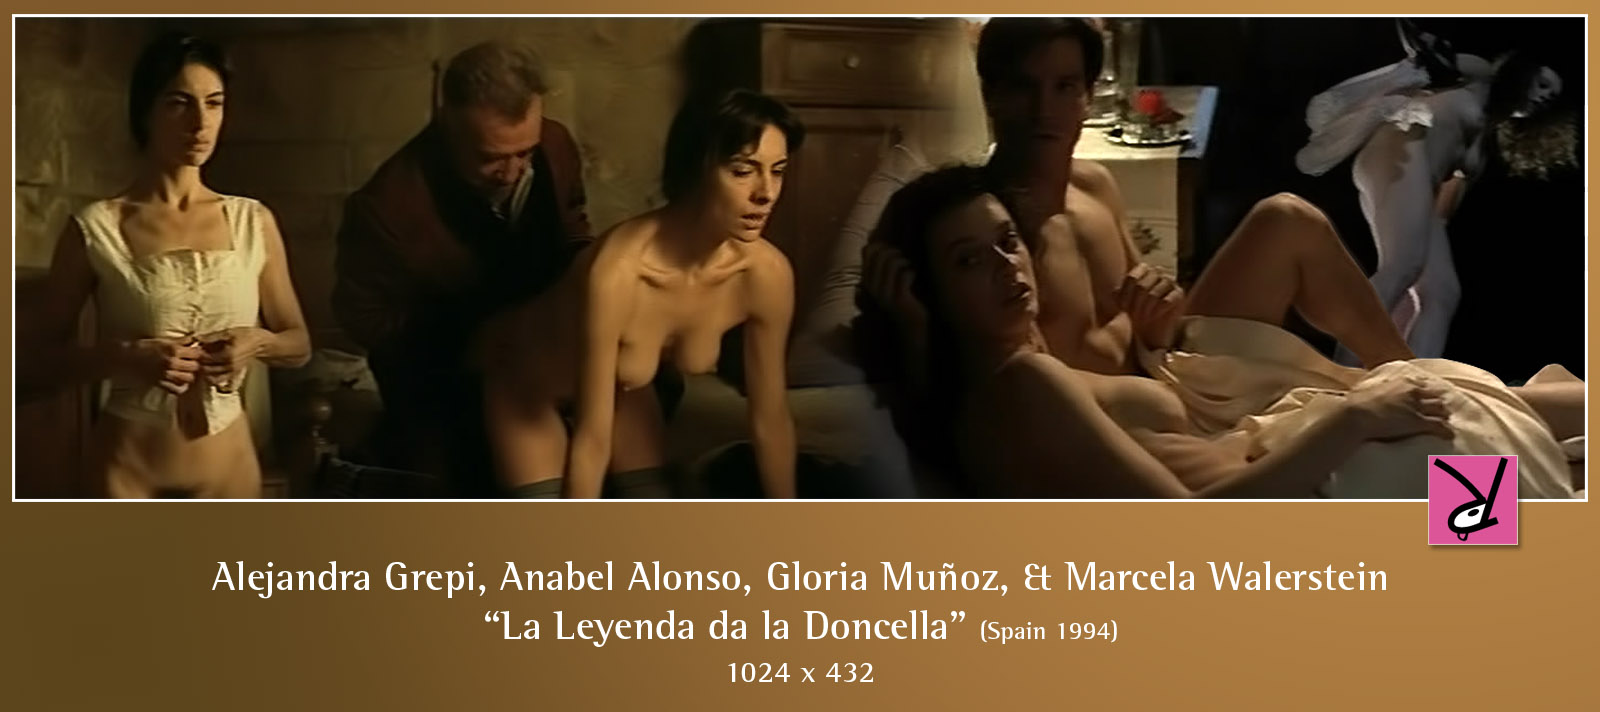 Alejandra grepi la leyenda da la doncella - 3 part 3